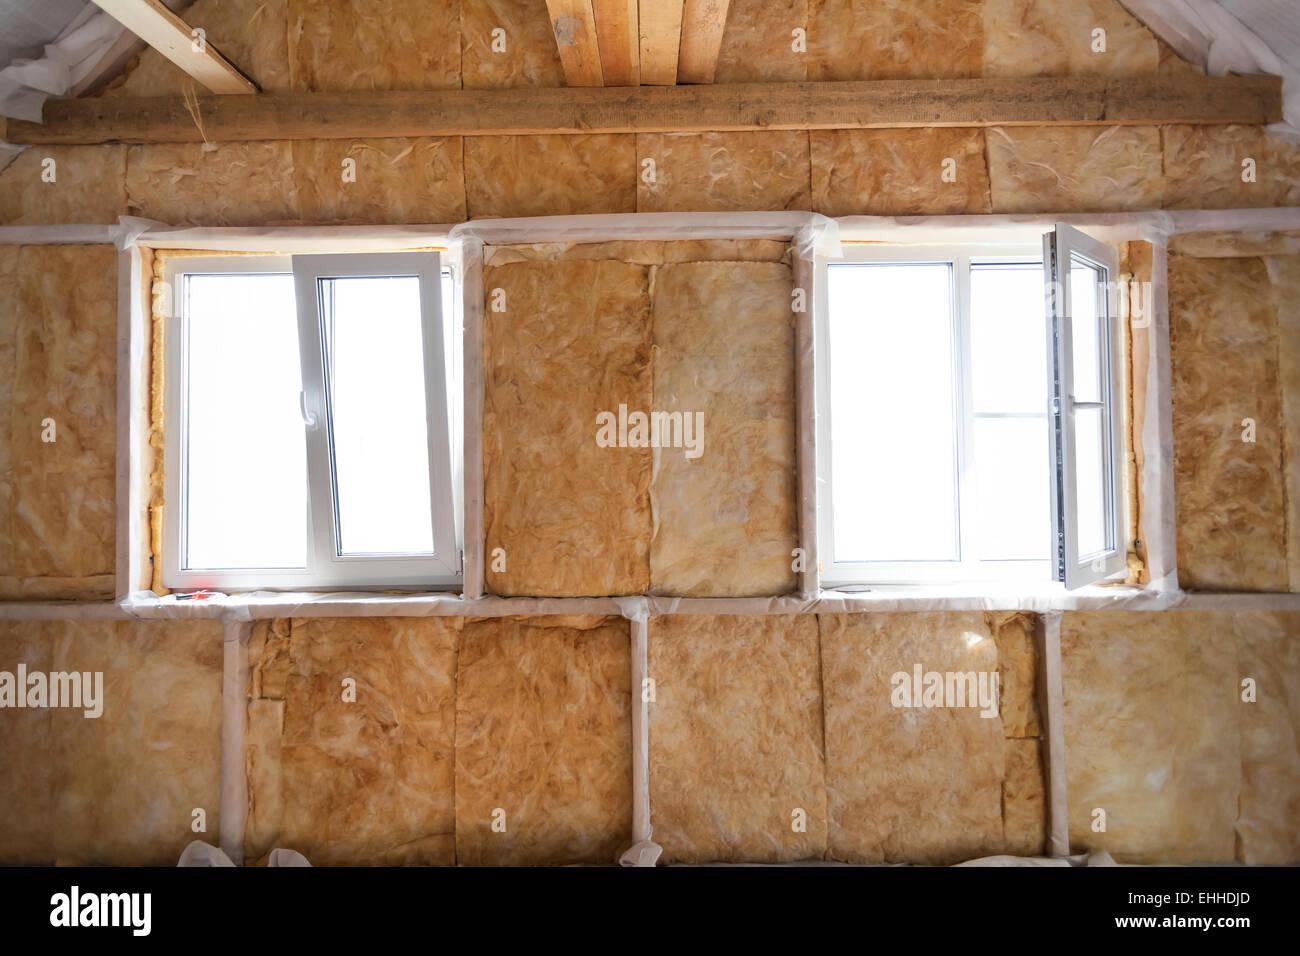 Awesome Innen Wand Mit Im Holzhaus Gebude Im Bau With Wand Innen